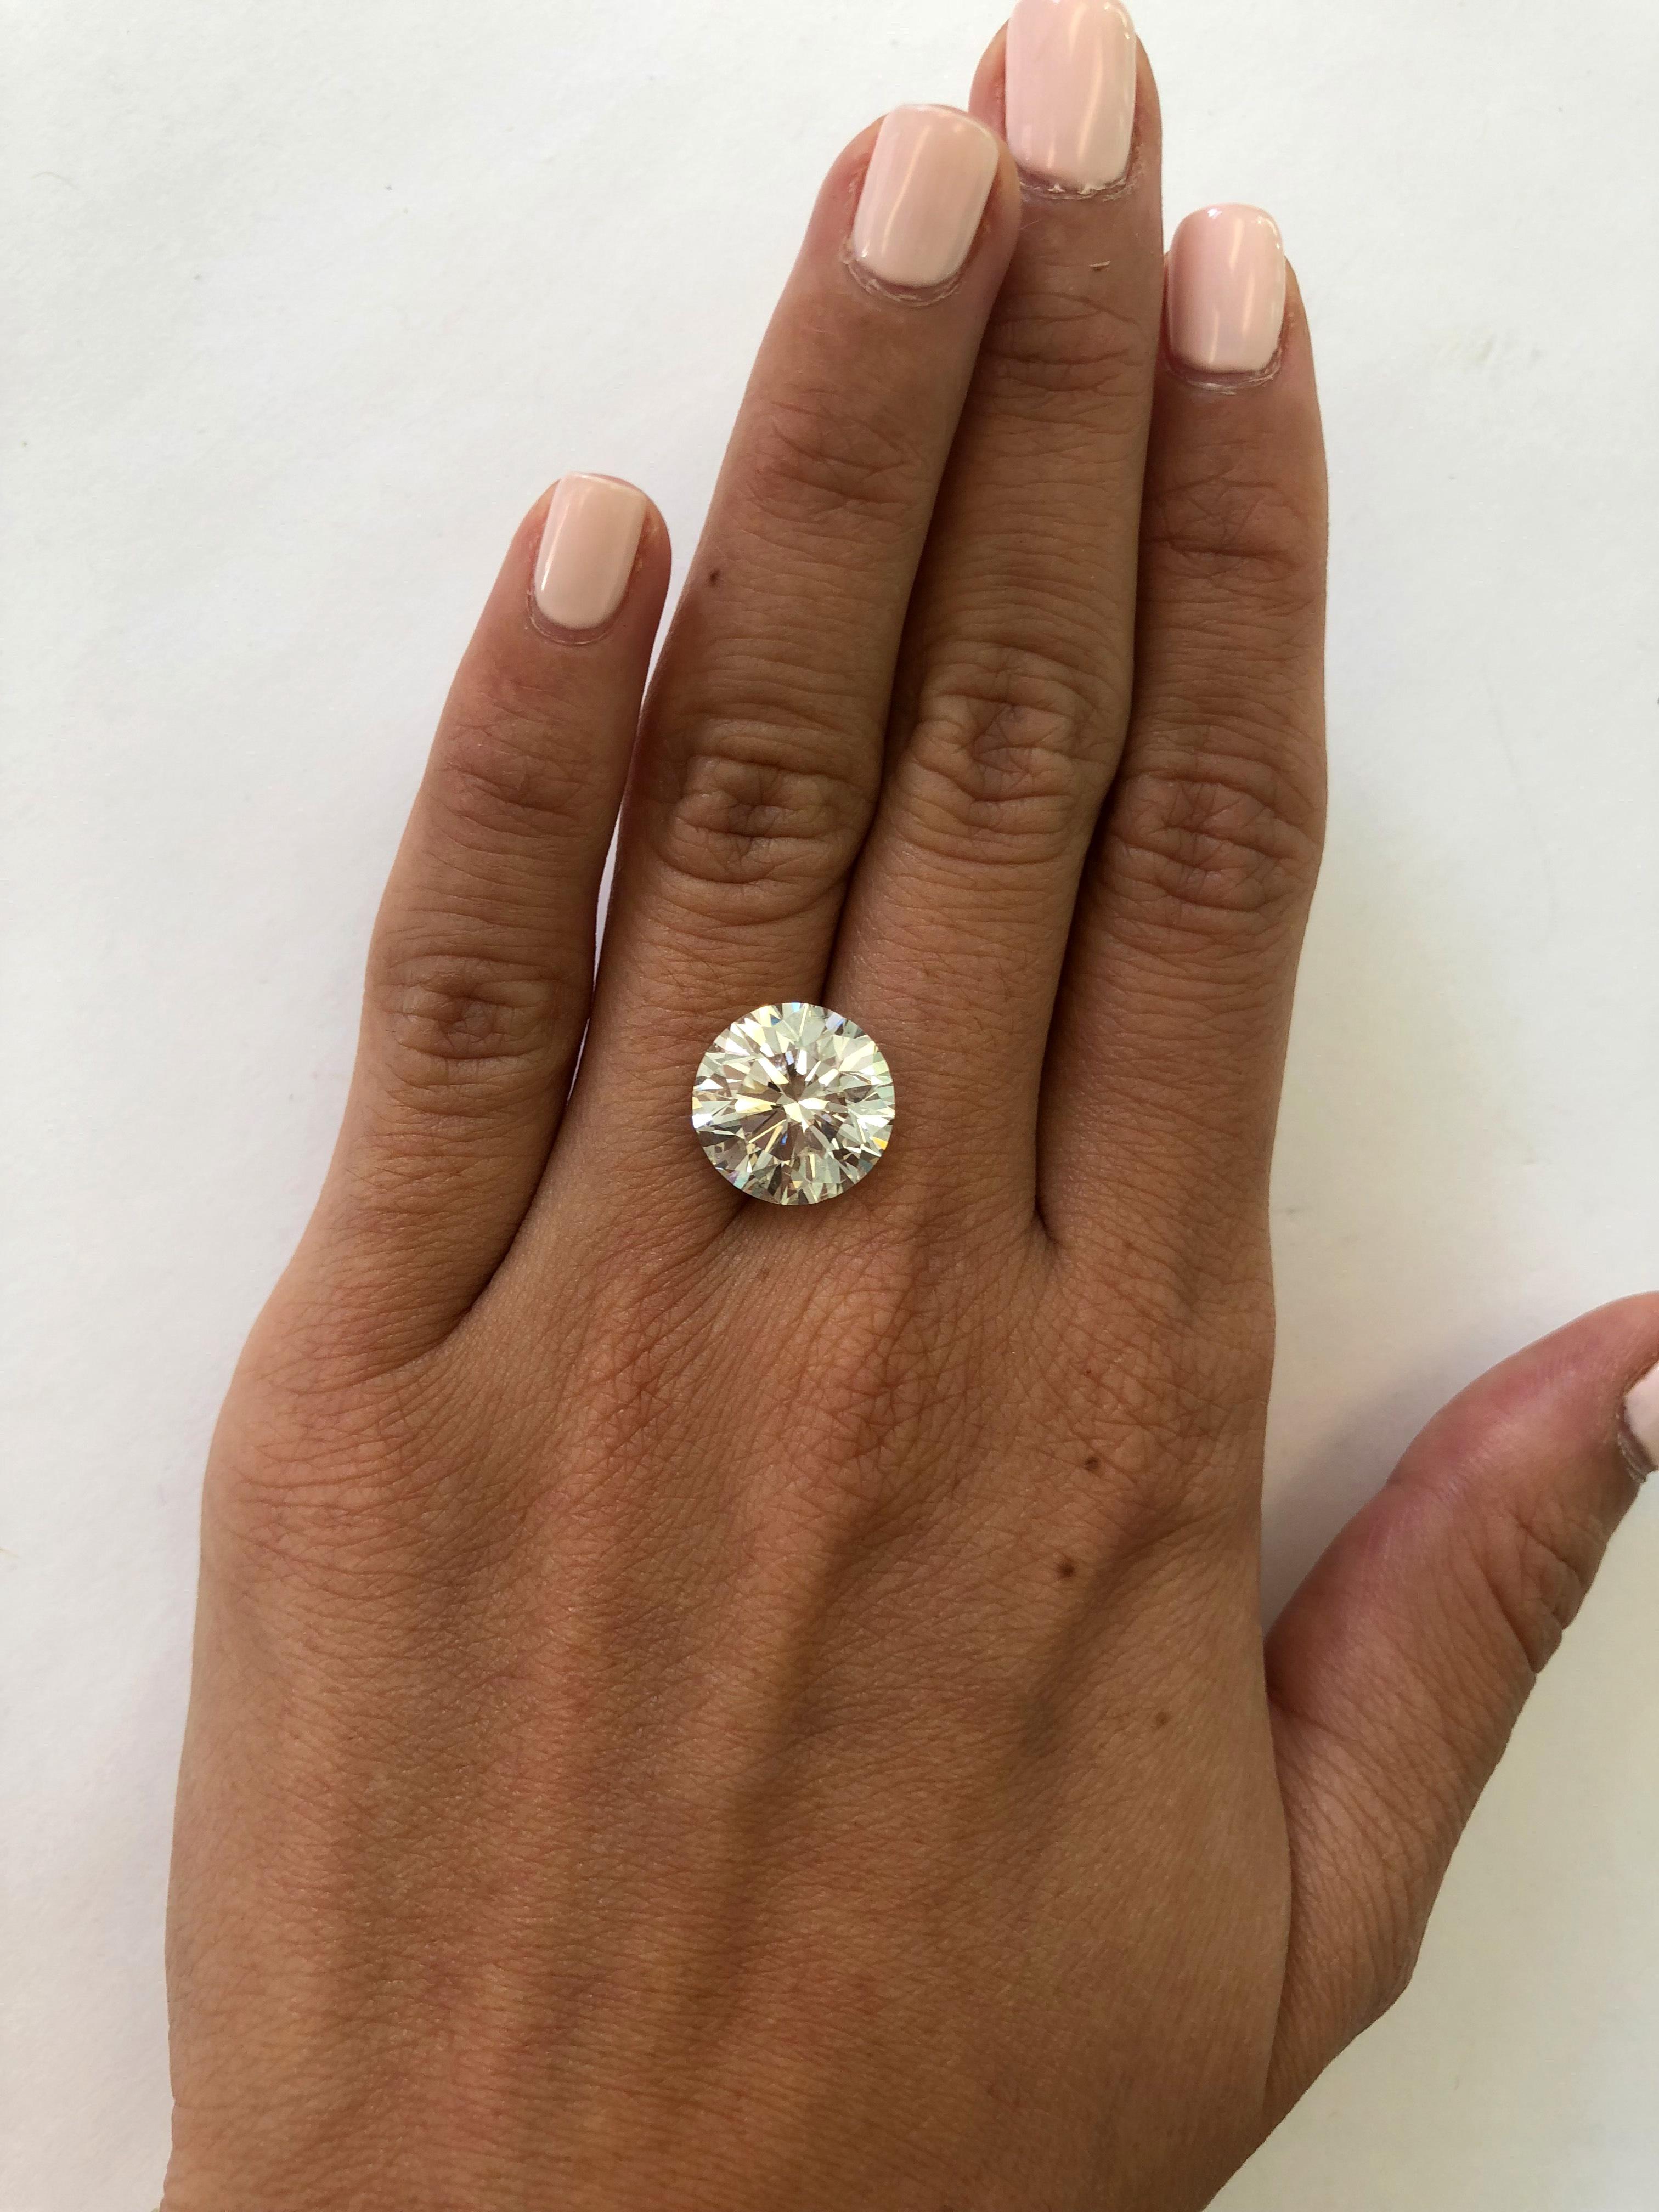 hand with 7 carat diamond